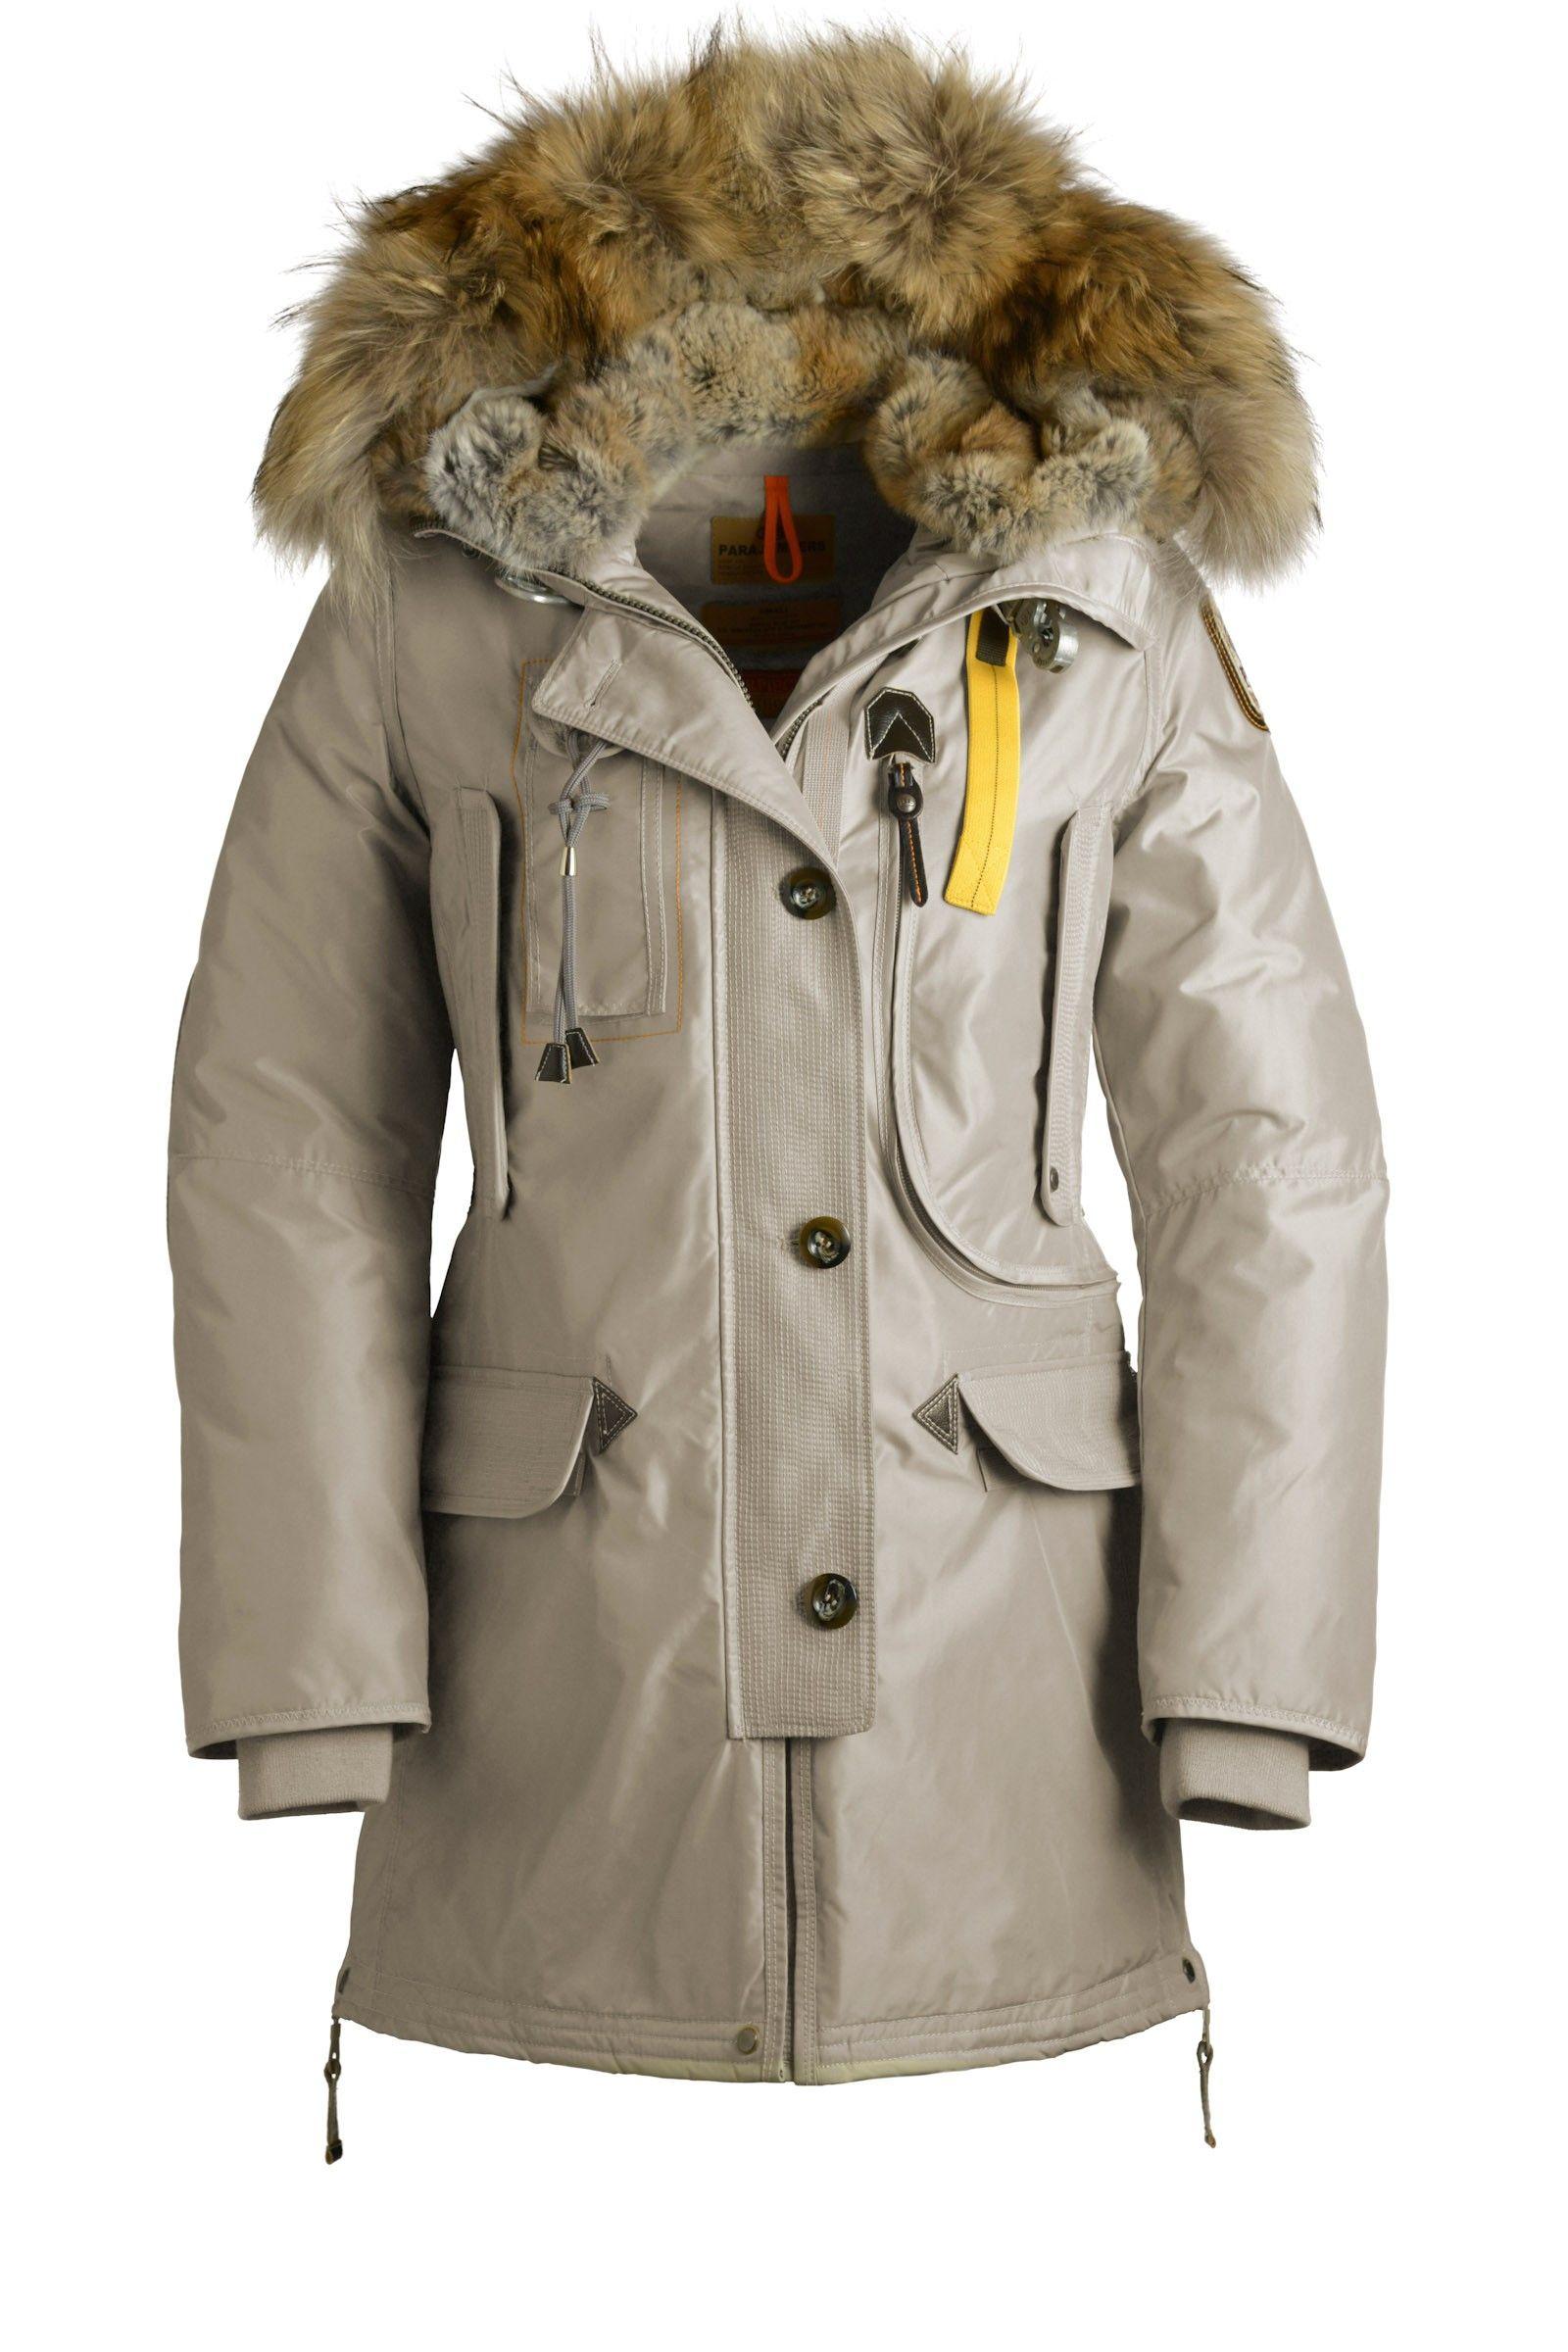 parajumpers jacket canada